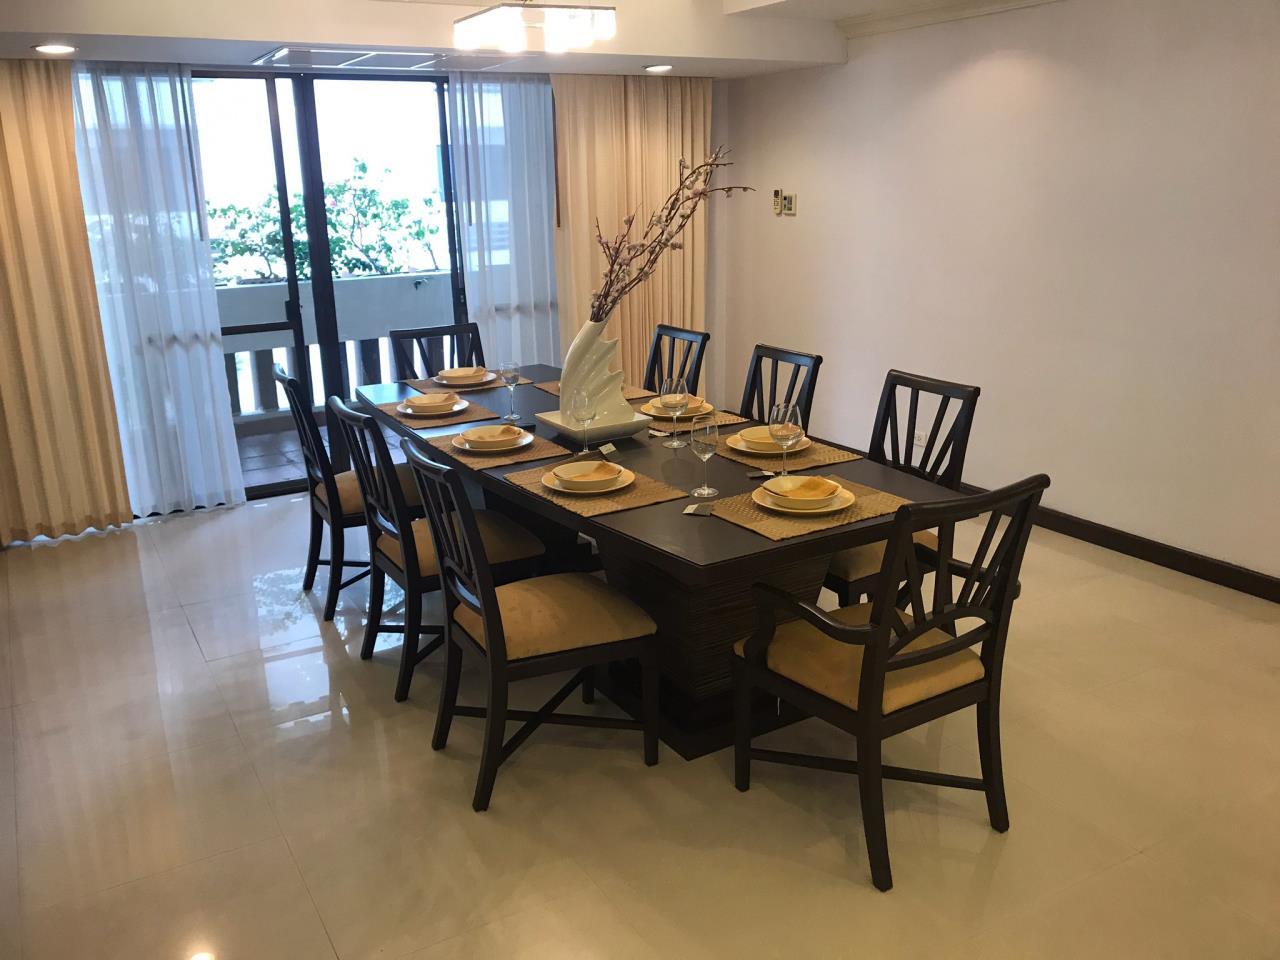 Blueocean property Agency's Condo For Rent – Hawaiii Tower 5